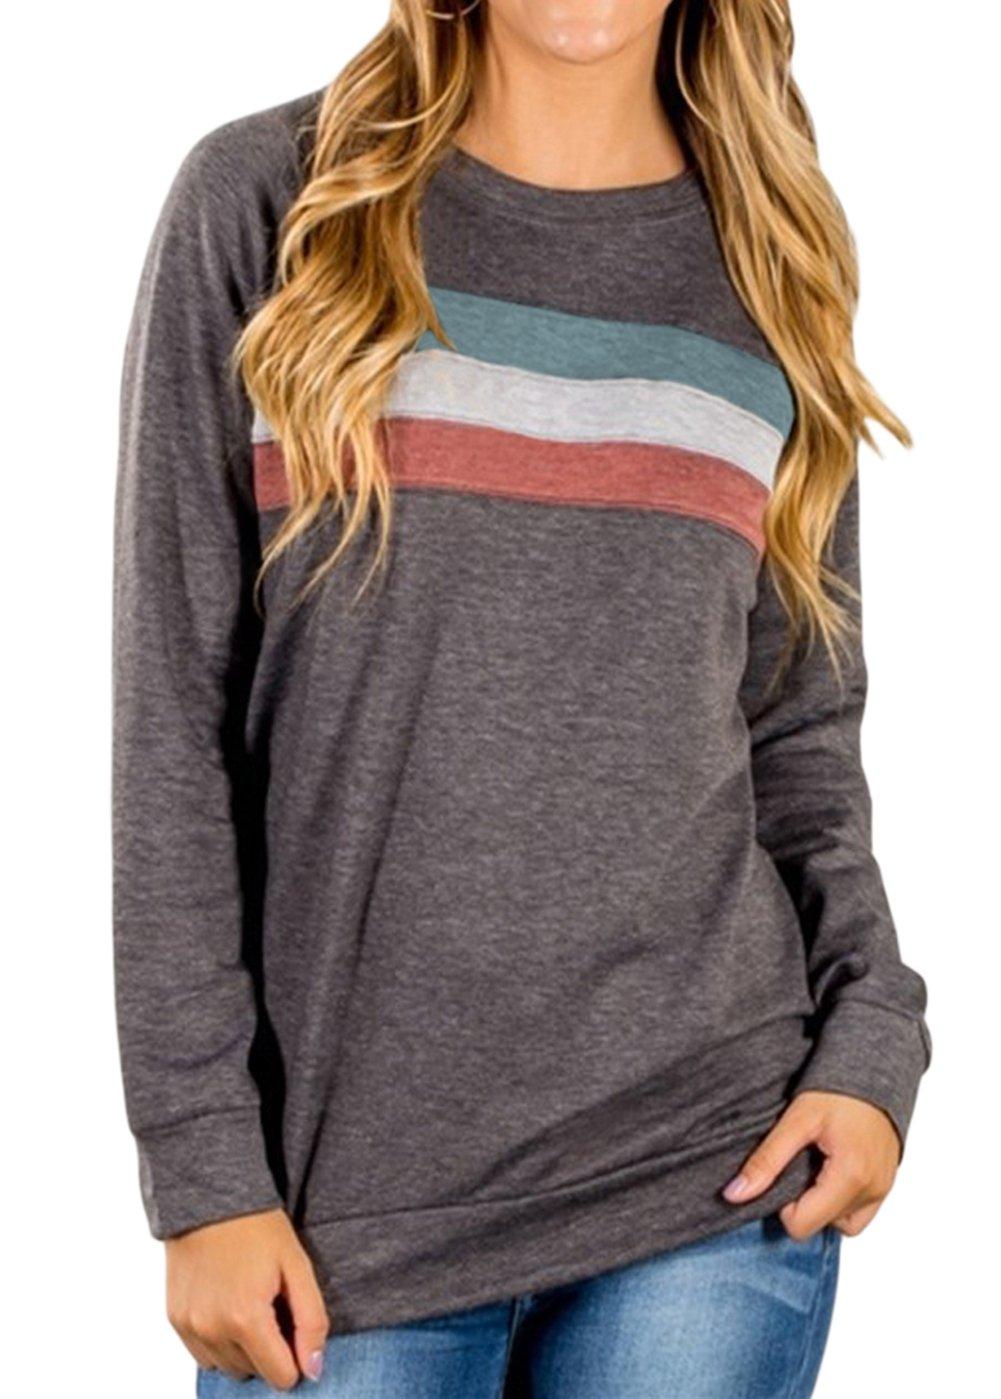 Shawhuwa Womens Casual Long Sleeve Loose Crewneck Sweatshirt Blouse Top XL Dark Grey